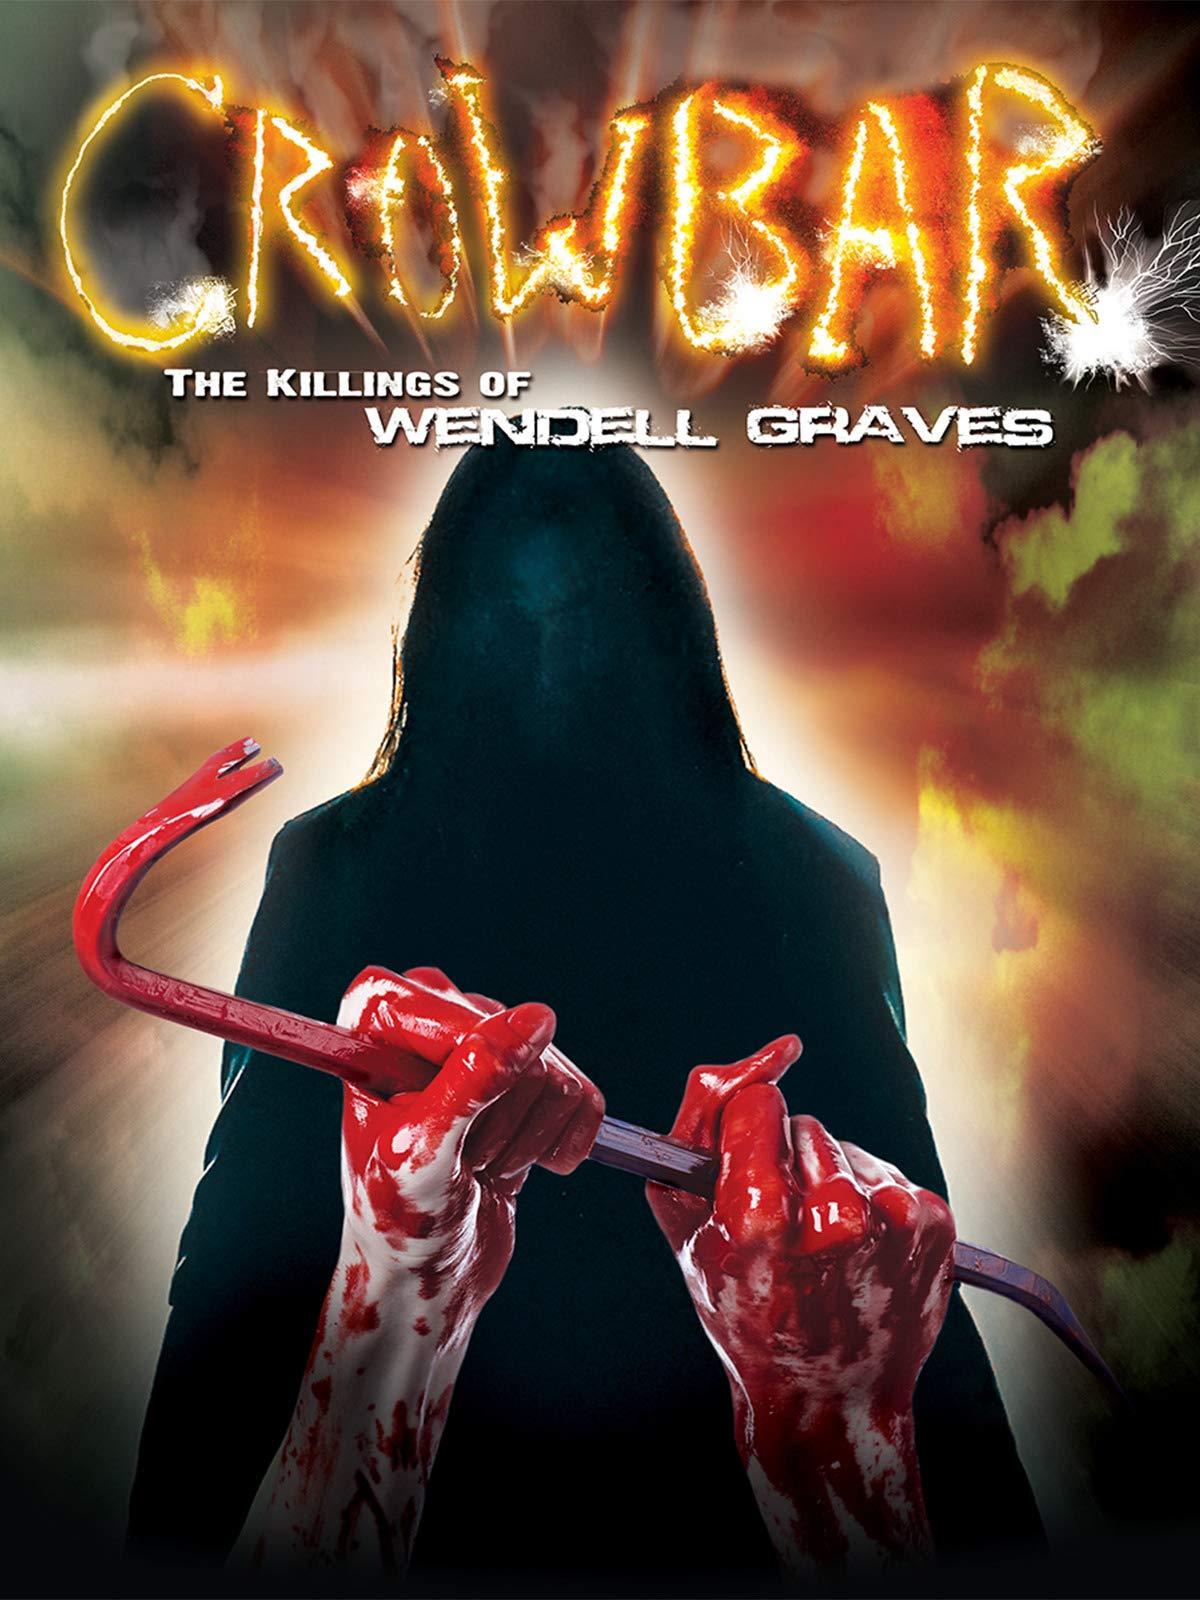 Crowbar: The Killings of Wendell Graves on Amazon Prime Video UK